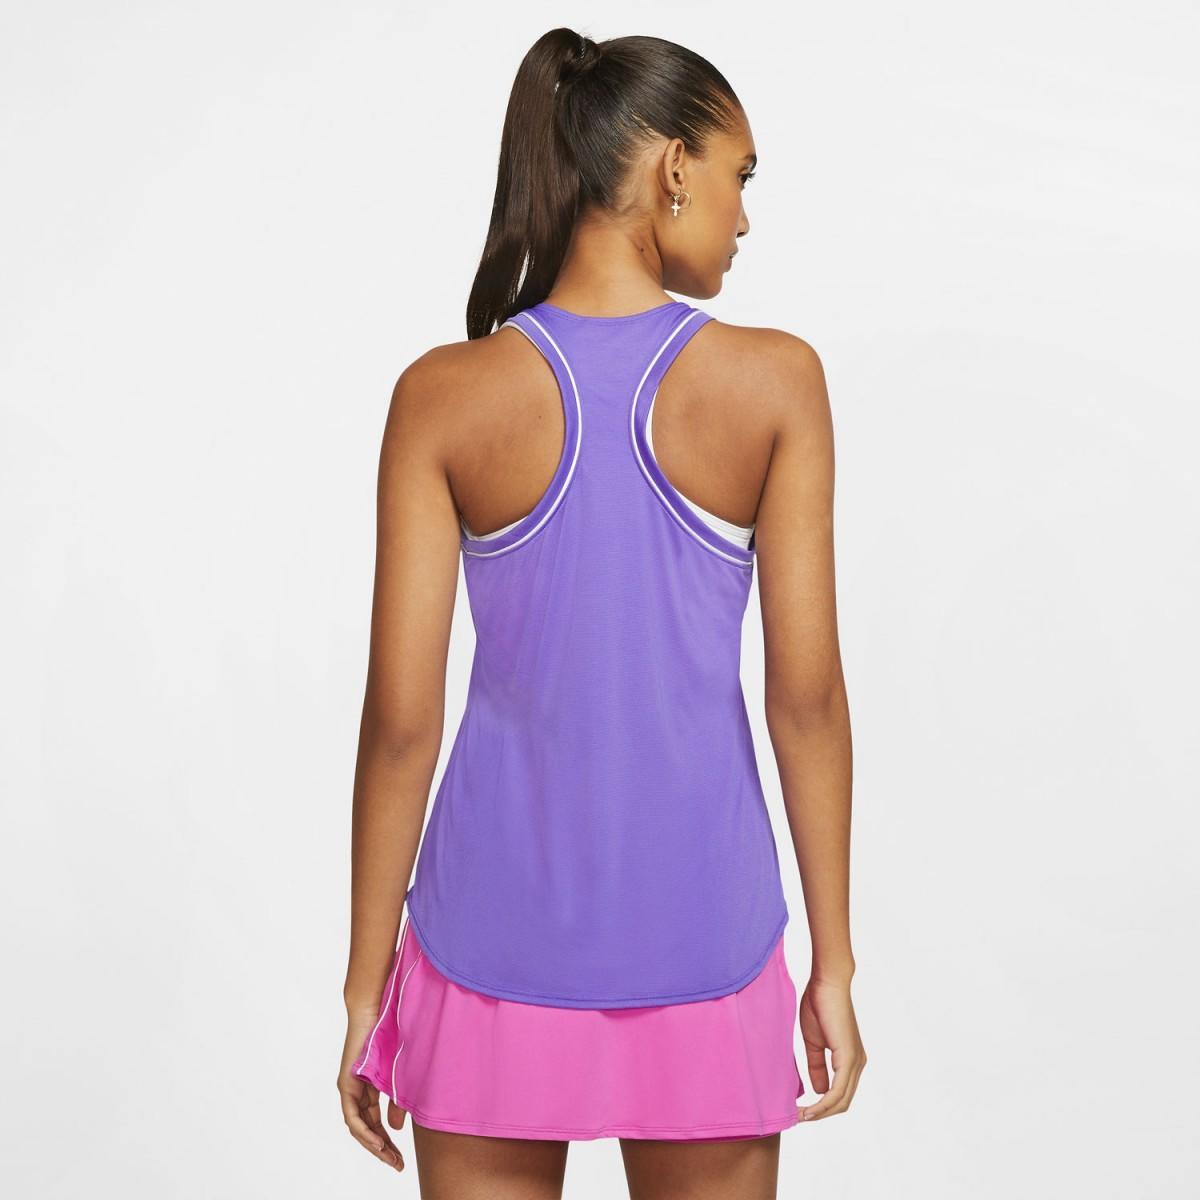 Теннисная майка женская Nike Court Dry Tank psychic purple/white/psychic purple